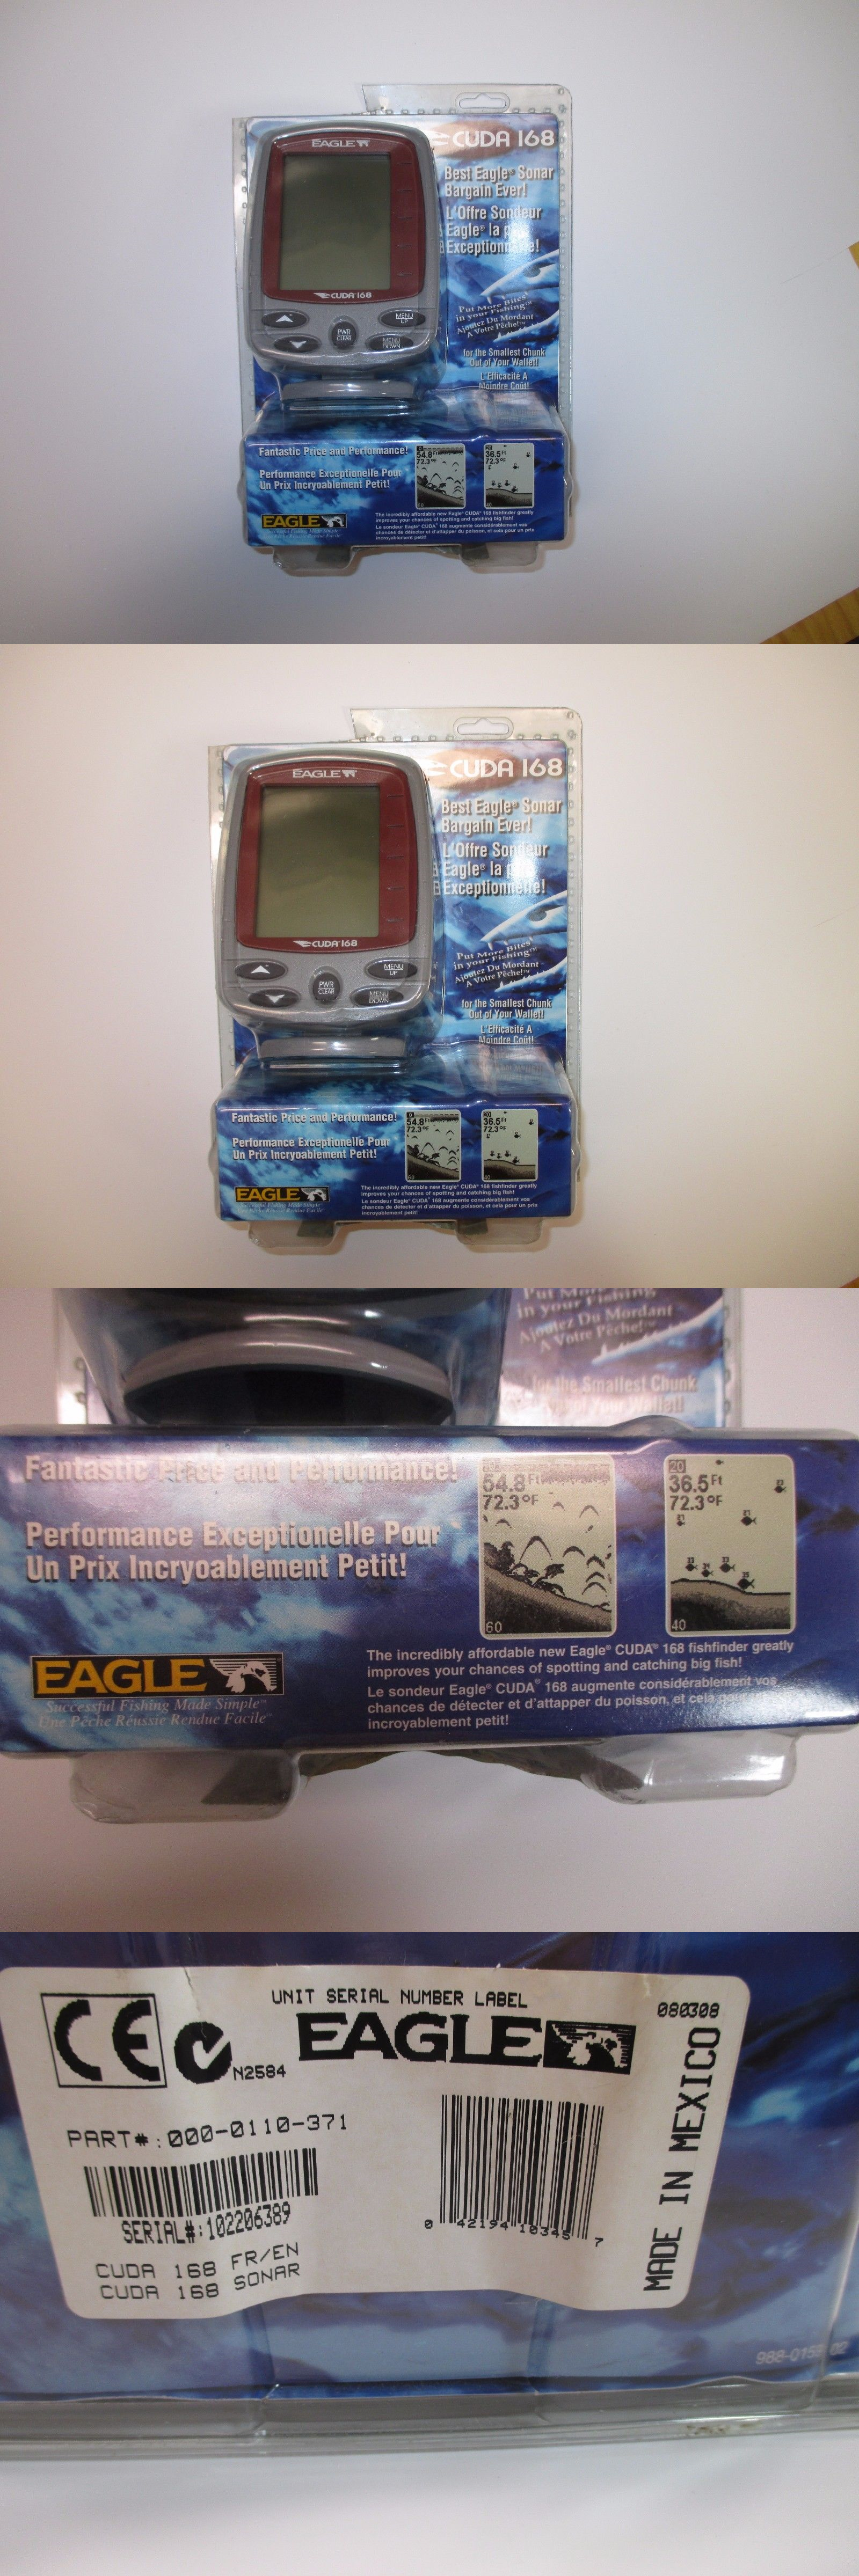 Eagle Cuda 168 Fish Finder Transducer Wire Diagram Fishfinders New Lowrance Wsu Temp Fastest Shipping Buy It Now Only On Ebay